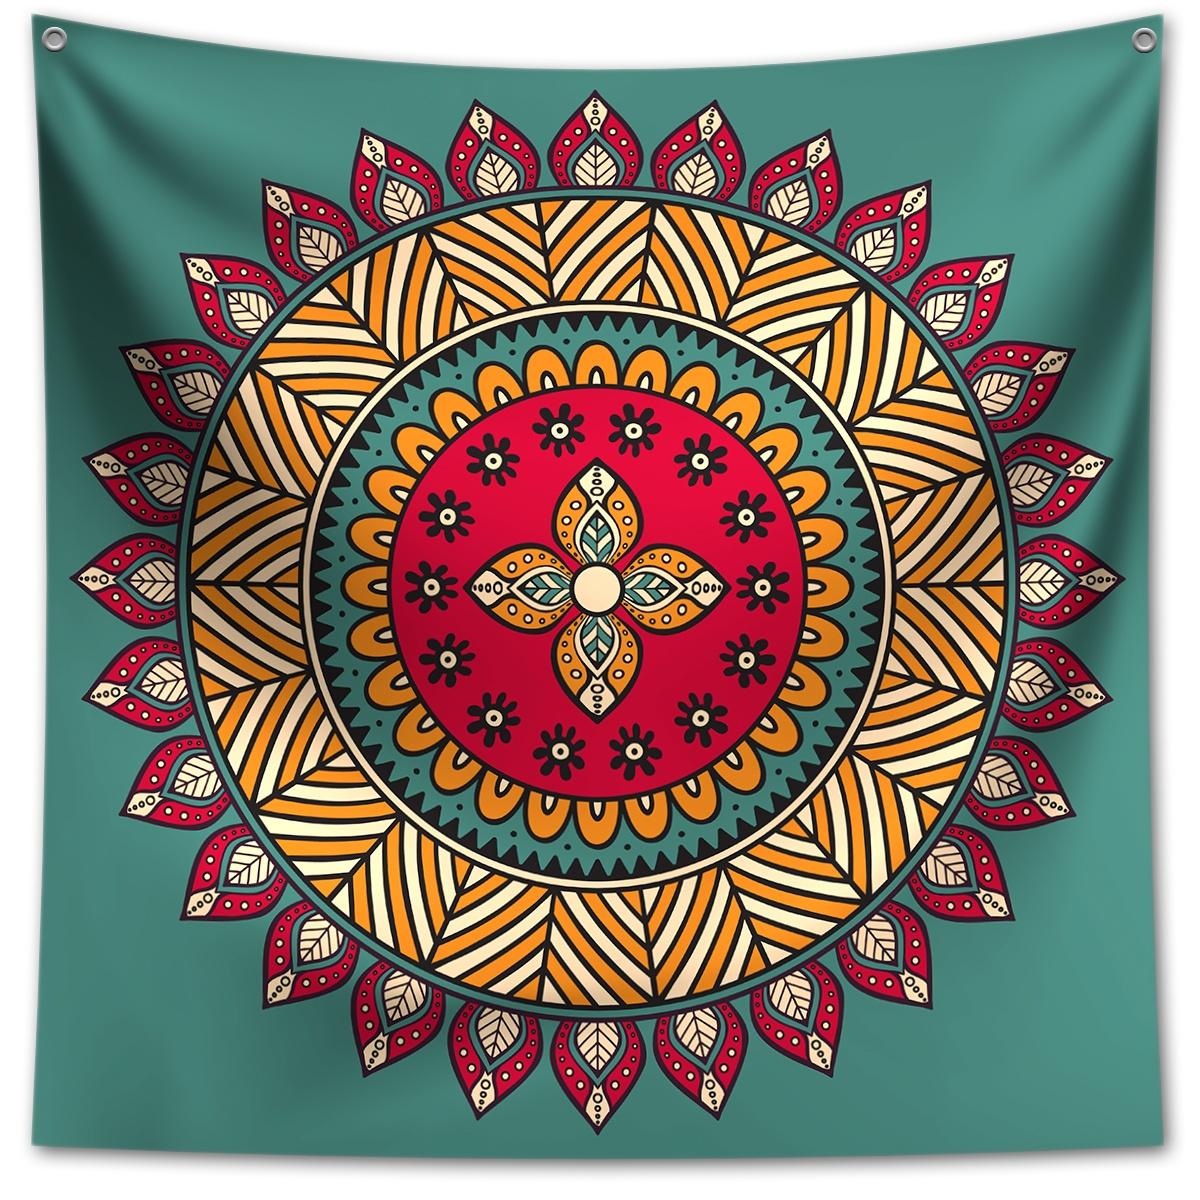 Panô Decorativo Mandala Verde - Banner